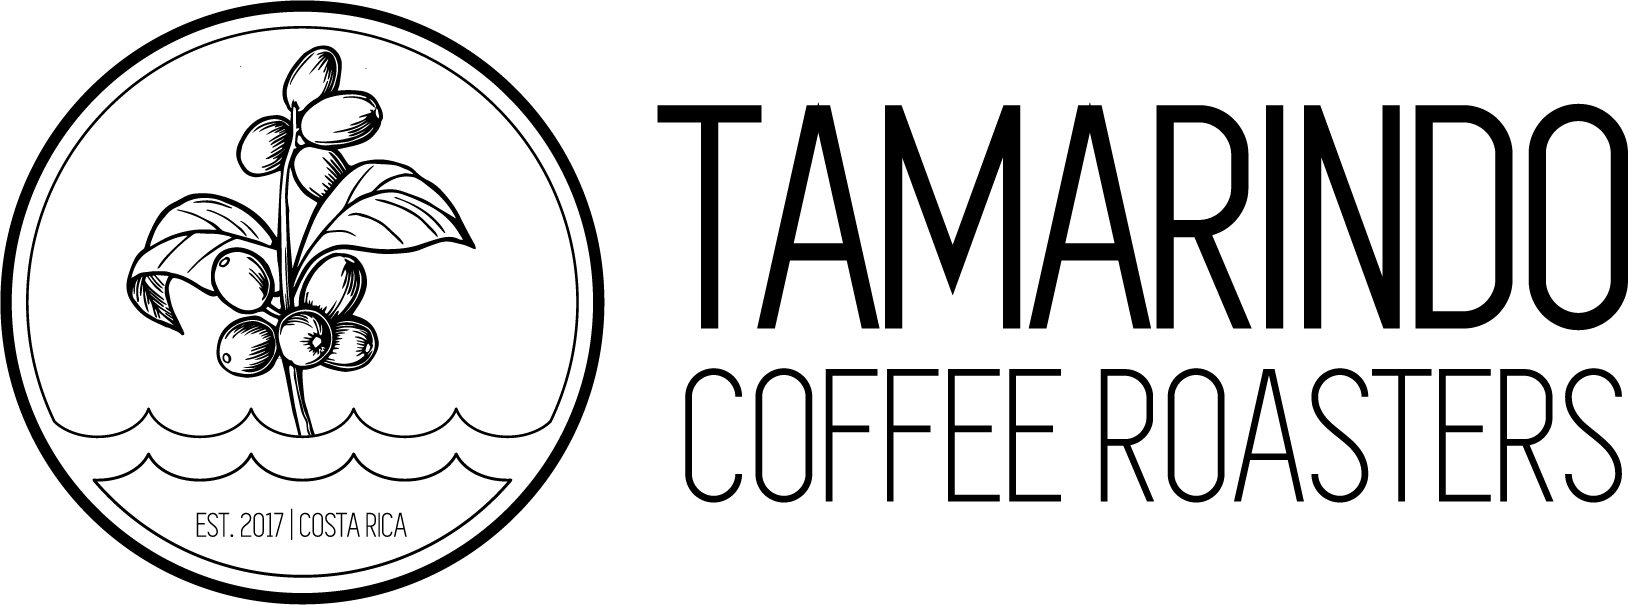 Tamarindo Coffee Roasters